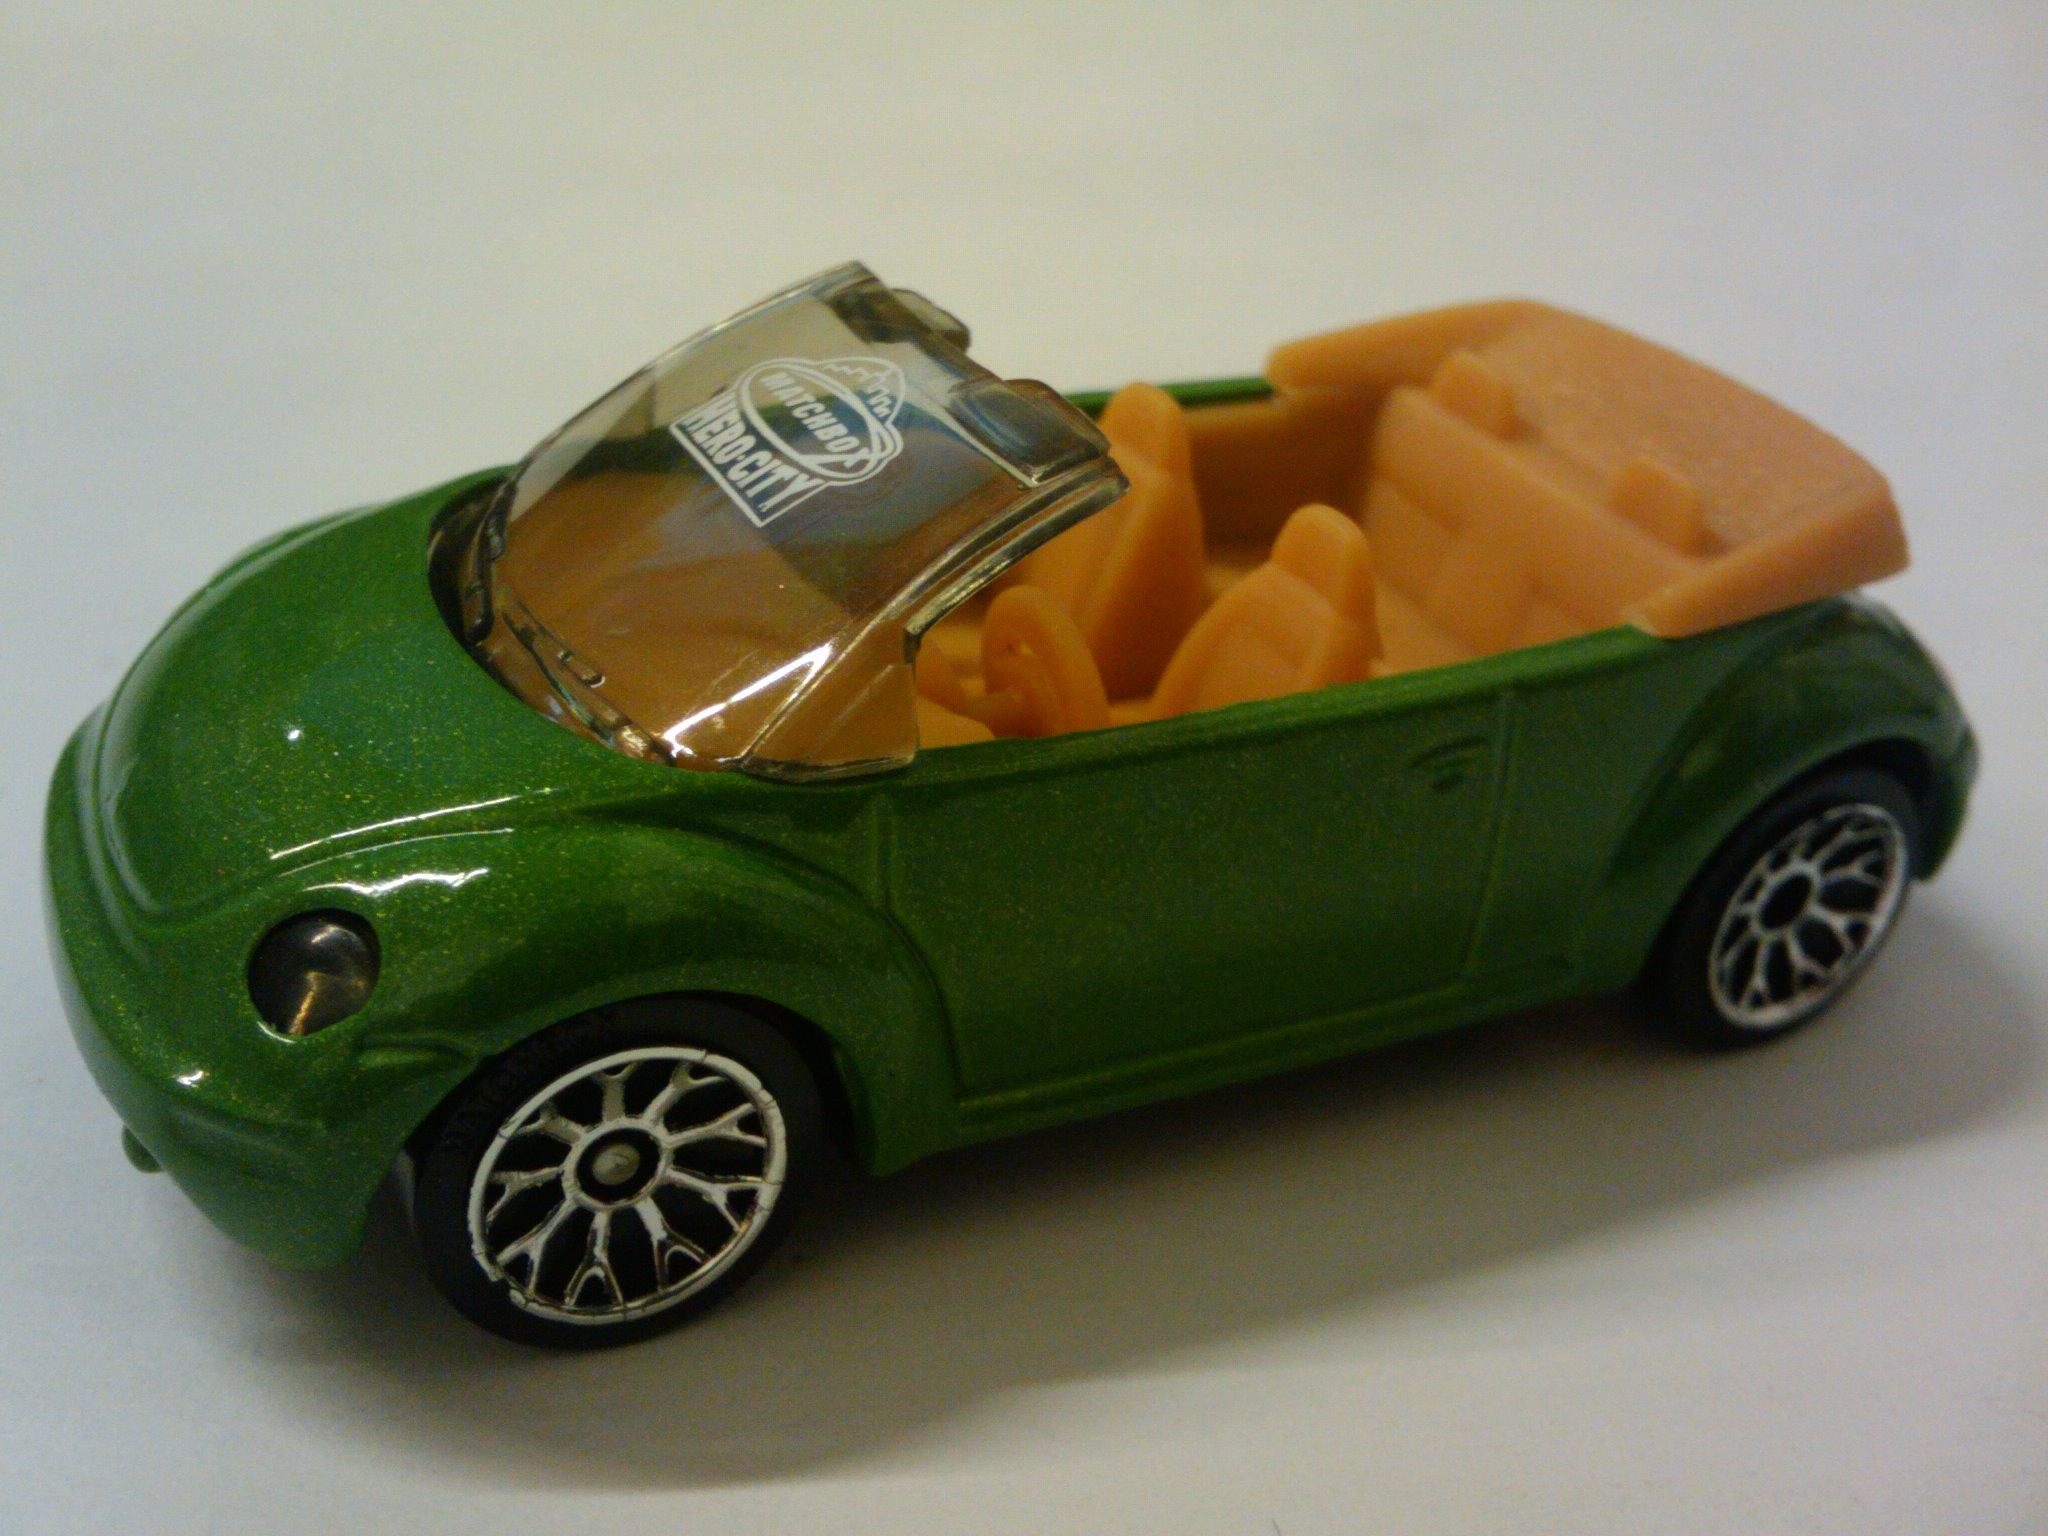 Hero City Concept 1 Beetle Convertible green.jpg